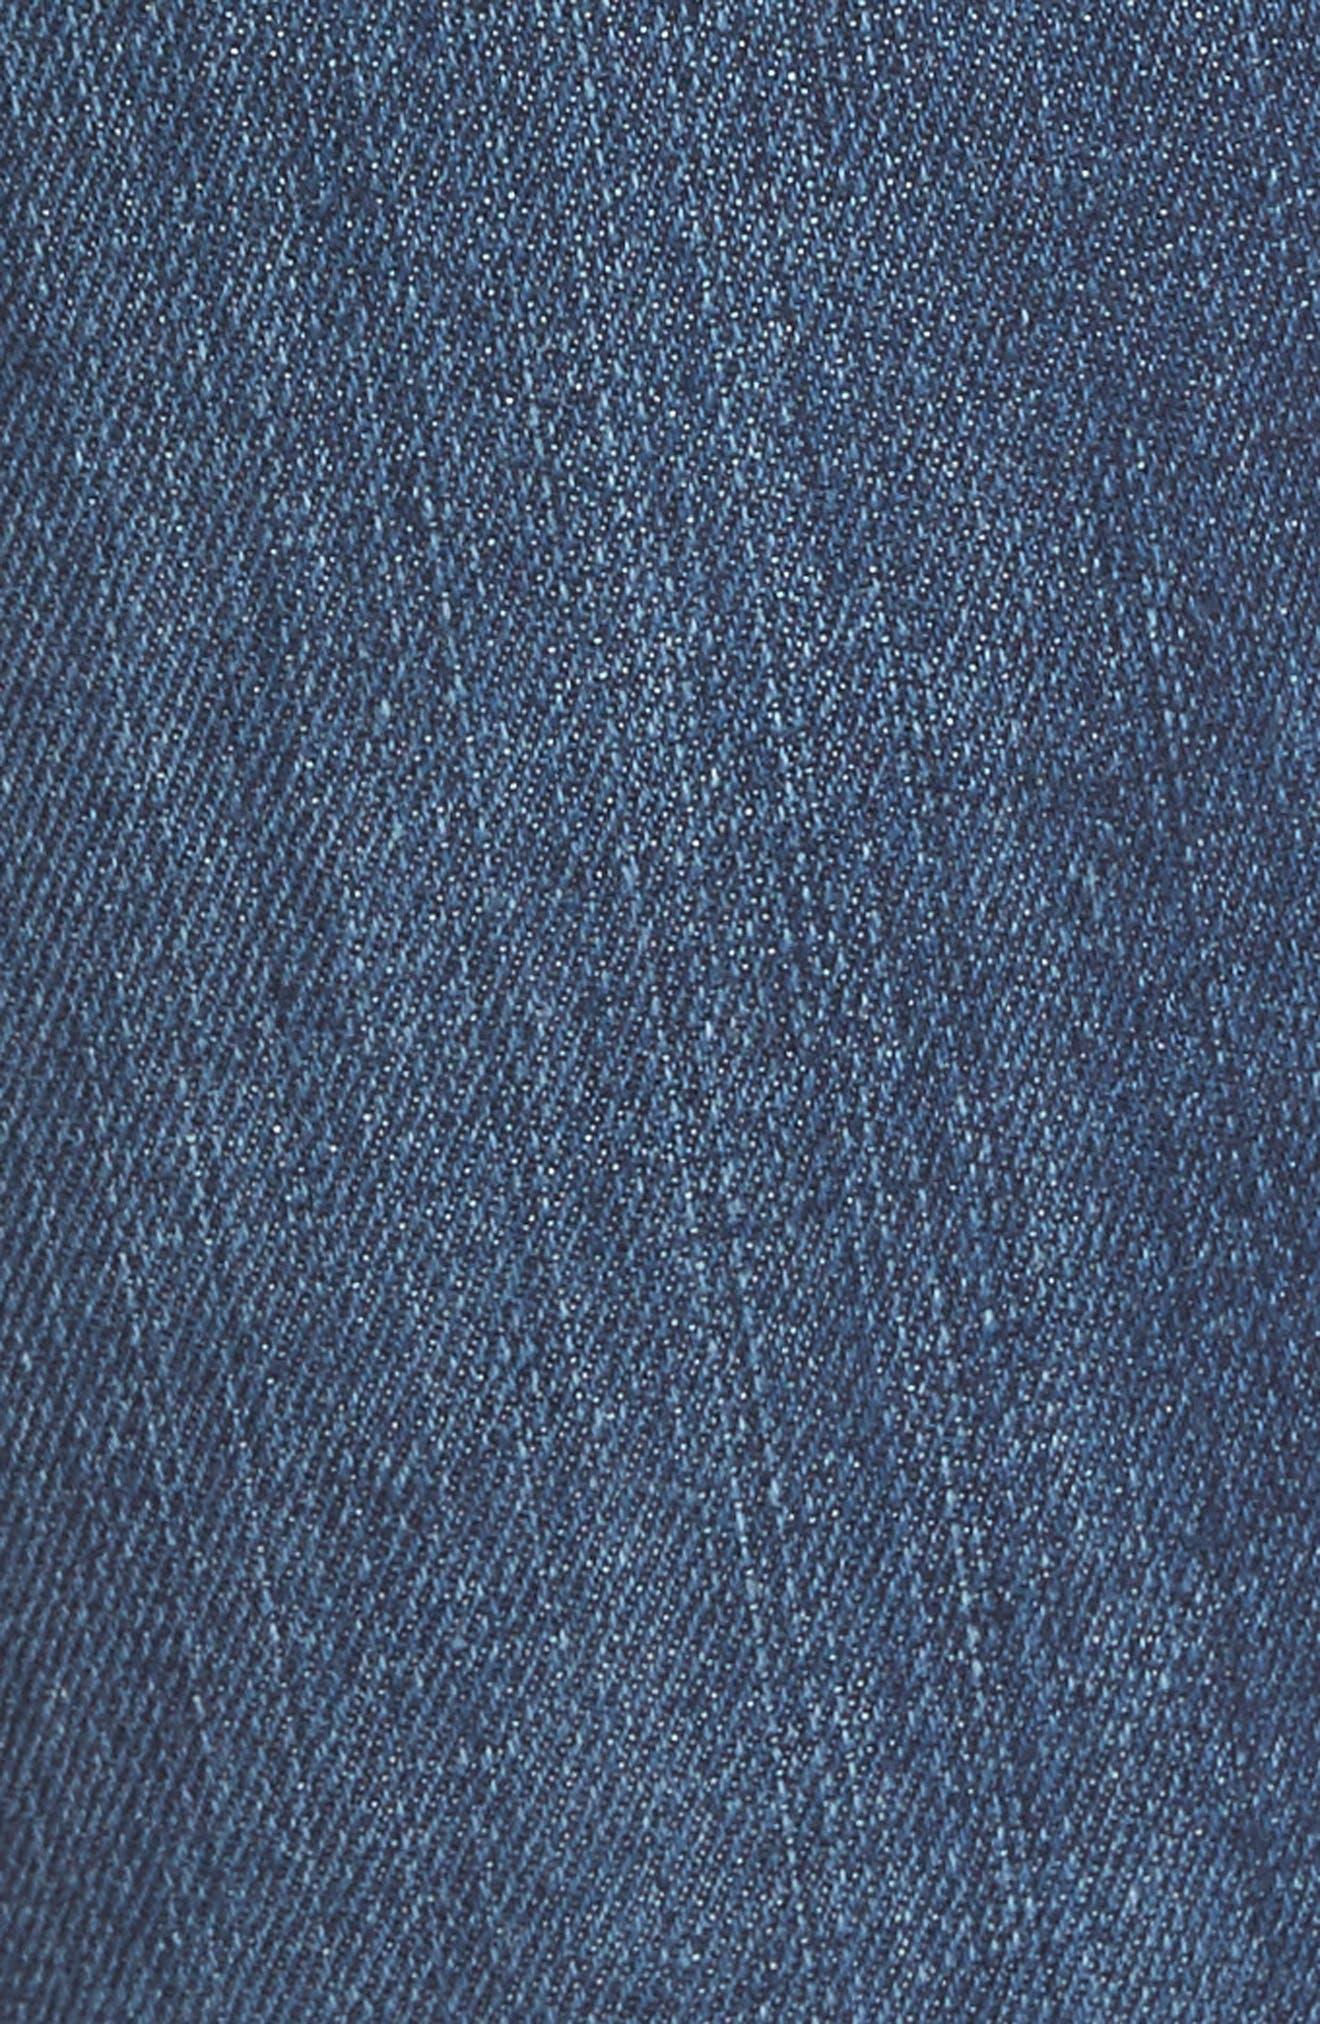 Alternate Image 5  - Good American Good Legs High Waist Skinny Jeans (Blue 046) (Extended Sizes)